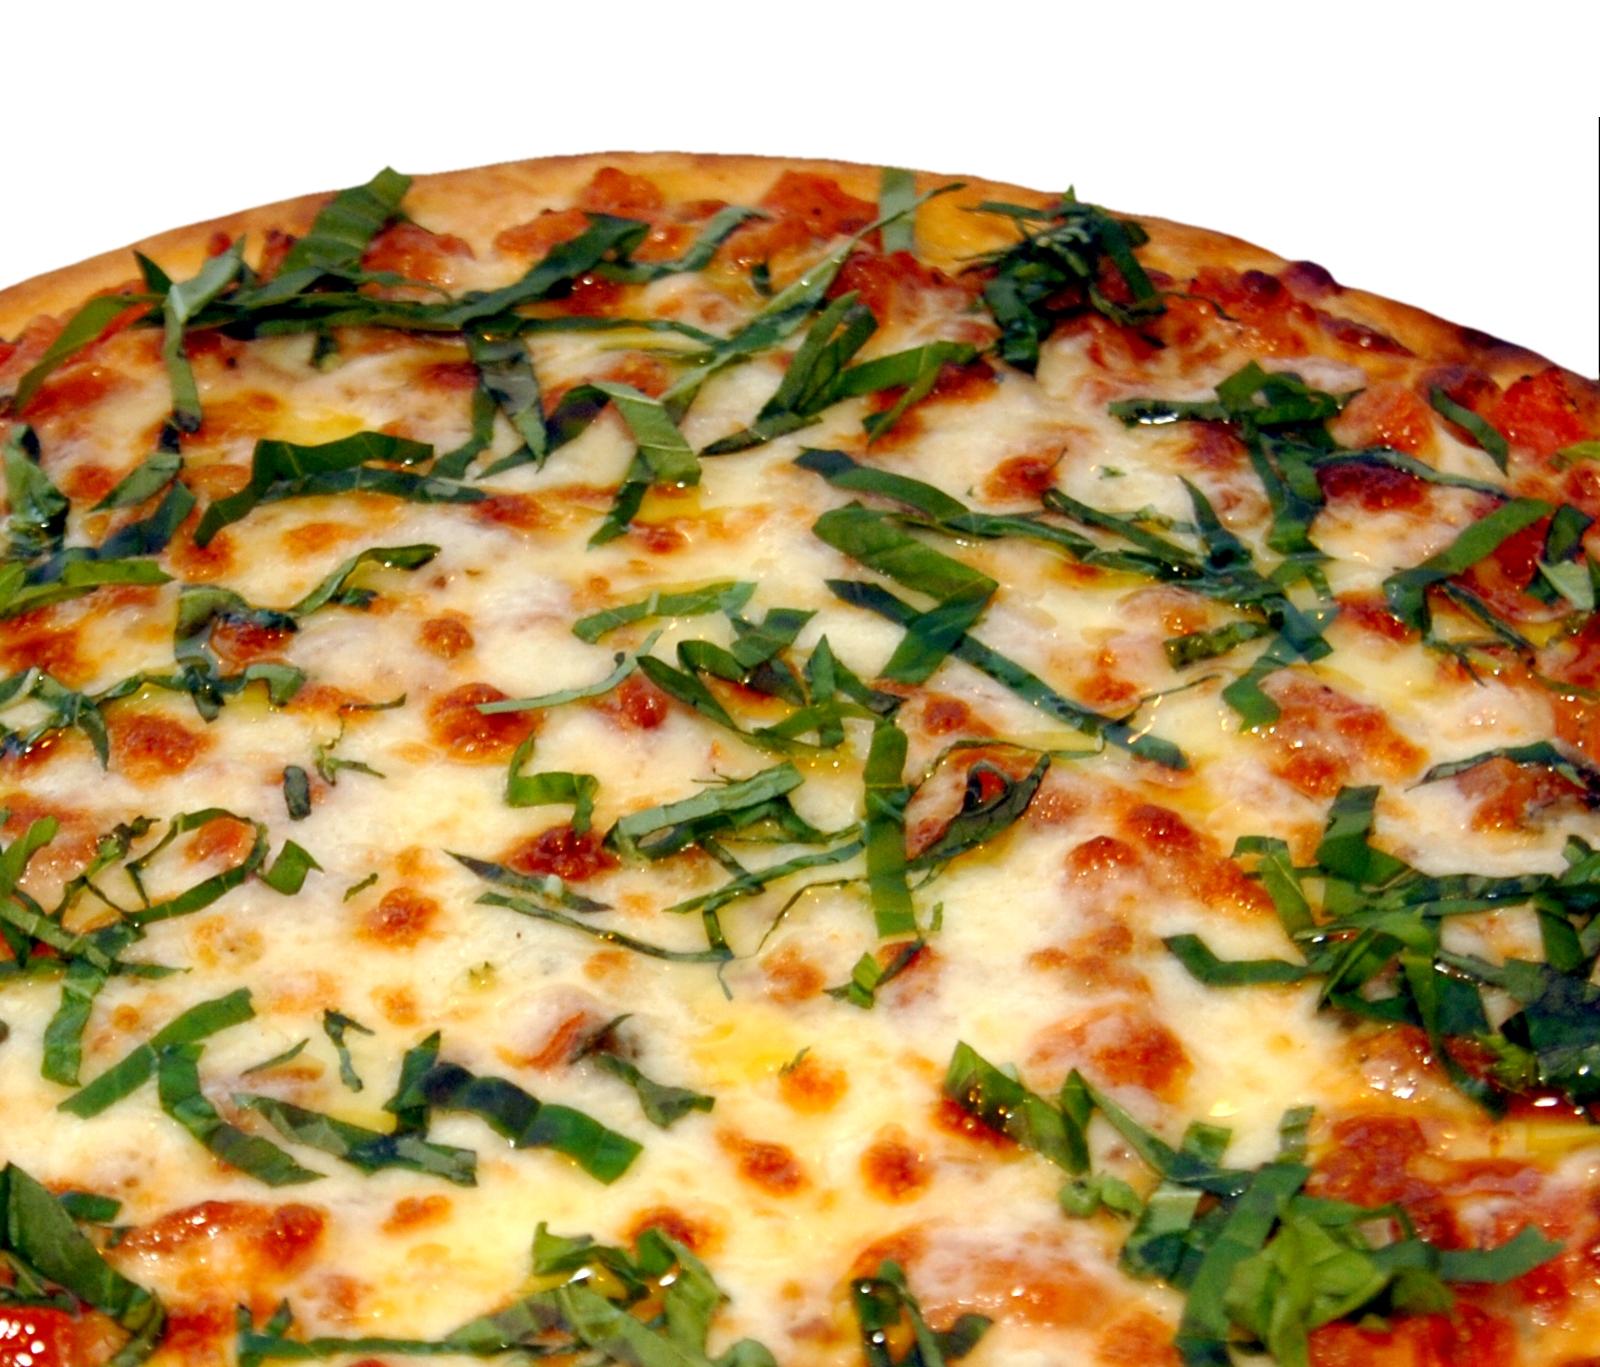 Dumpling Soup Woolworths Languageen: Tia Maria Pizza Wasabi